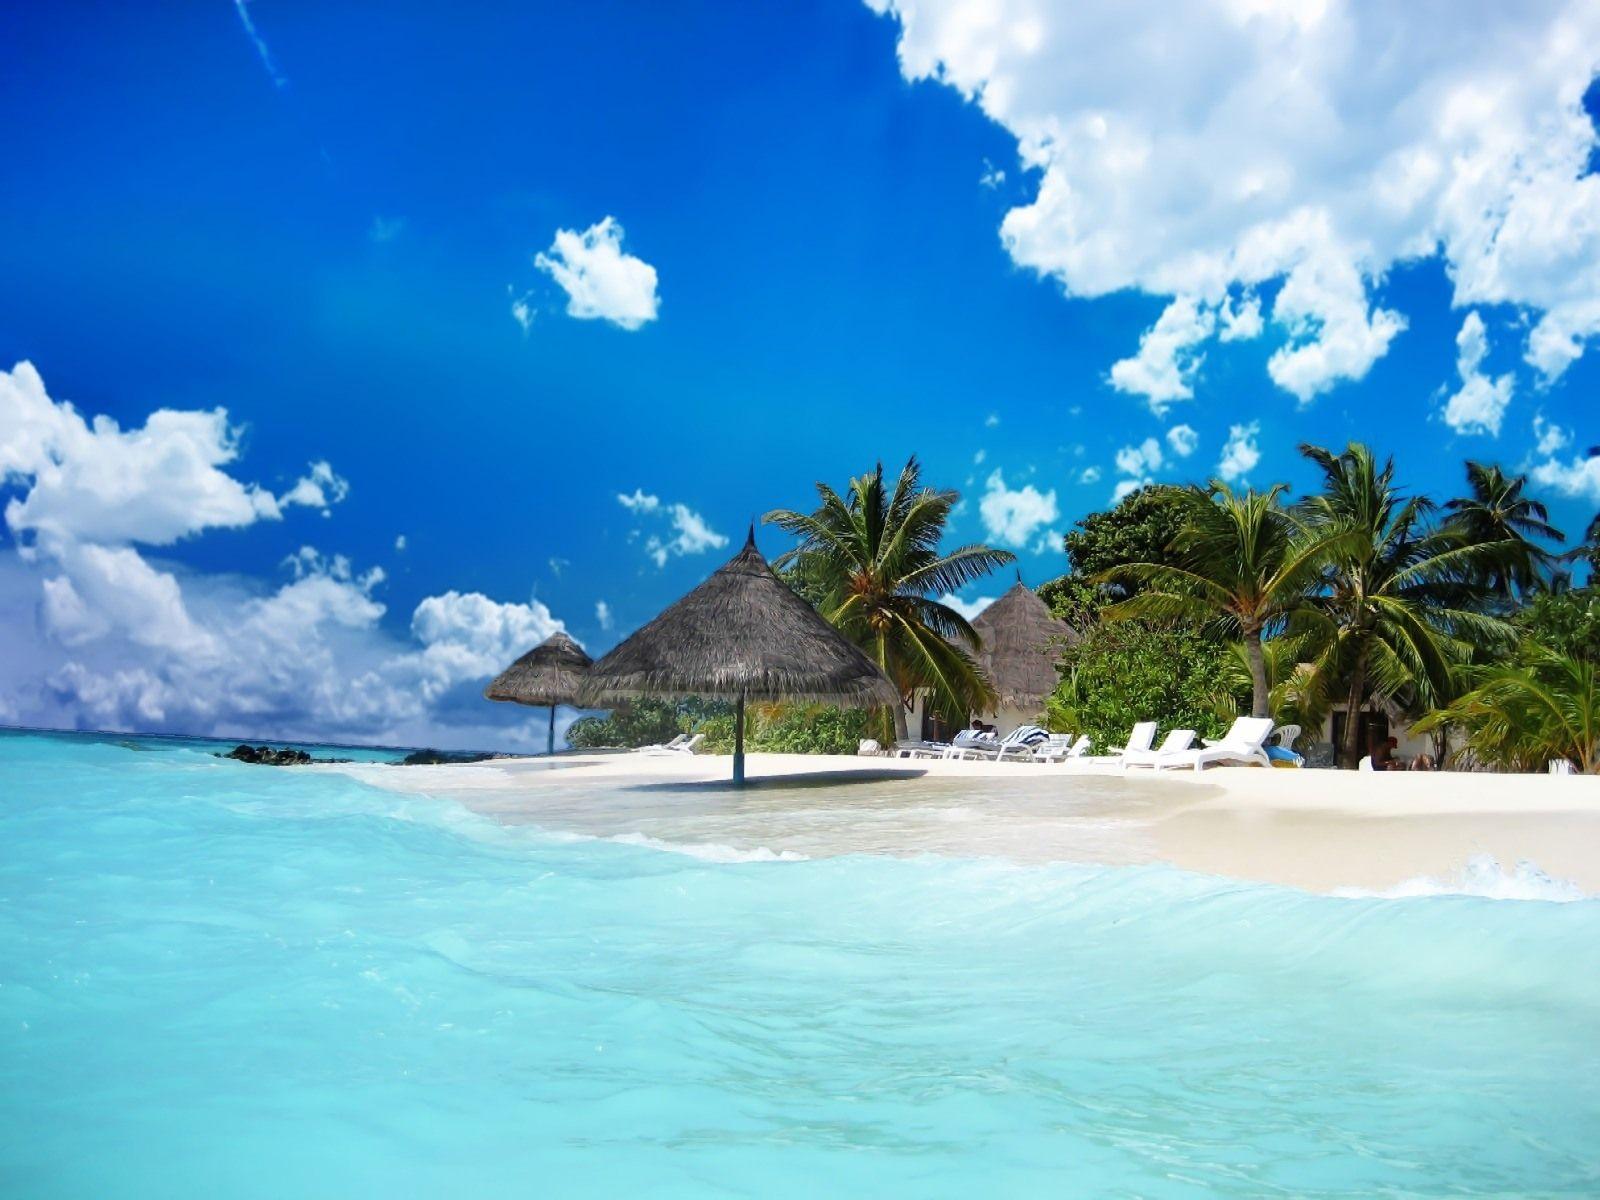 Hd wallpaper beach - 195 Best Nature Landscape Hd Wallpaper Images On Pinterest Nature Landscapes And Google Search